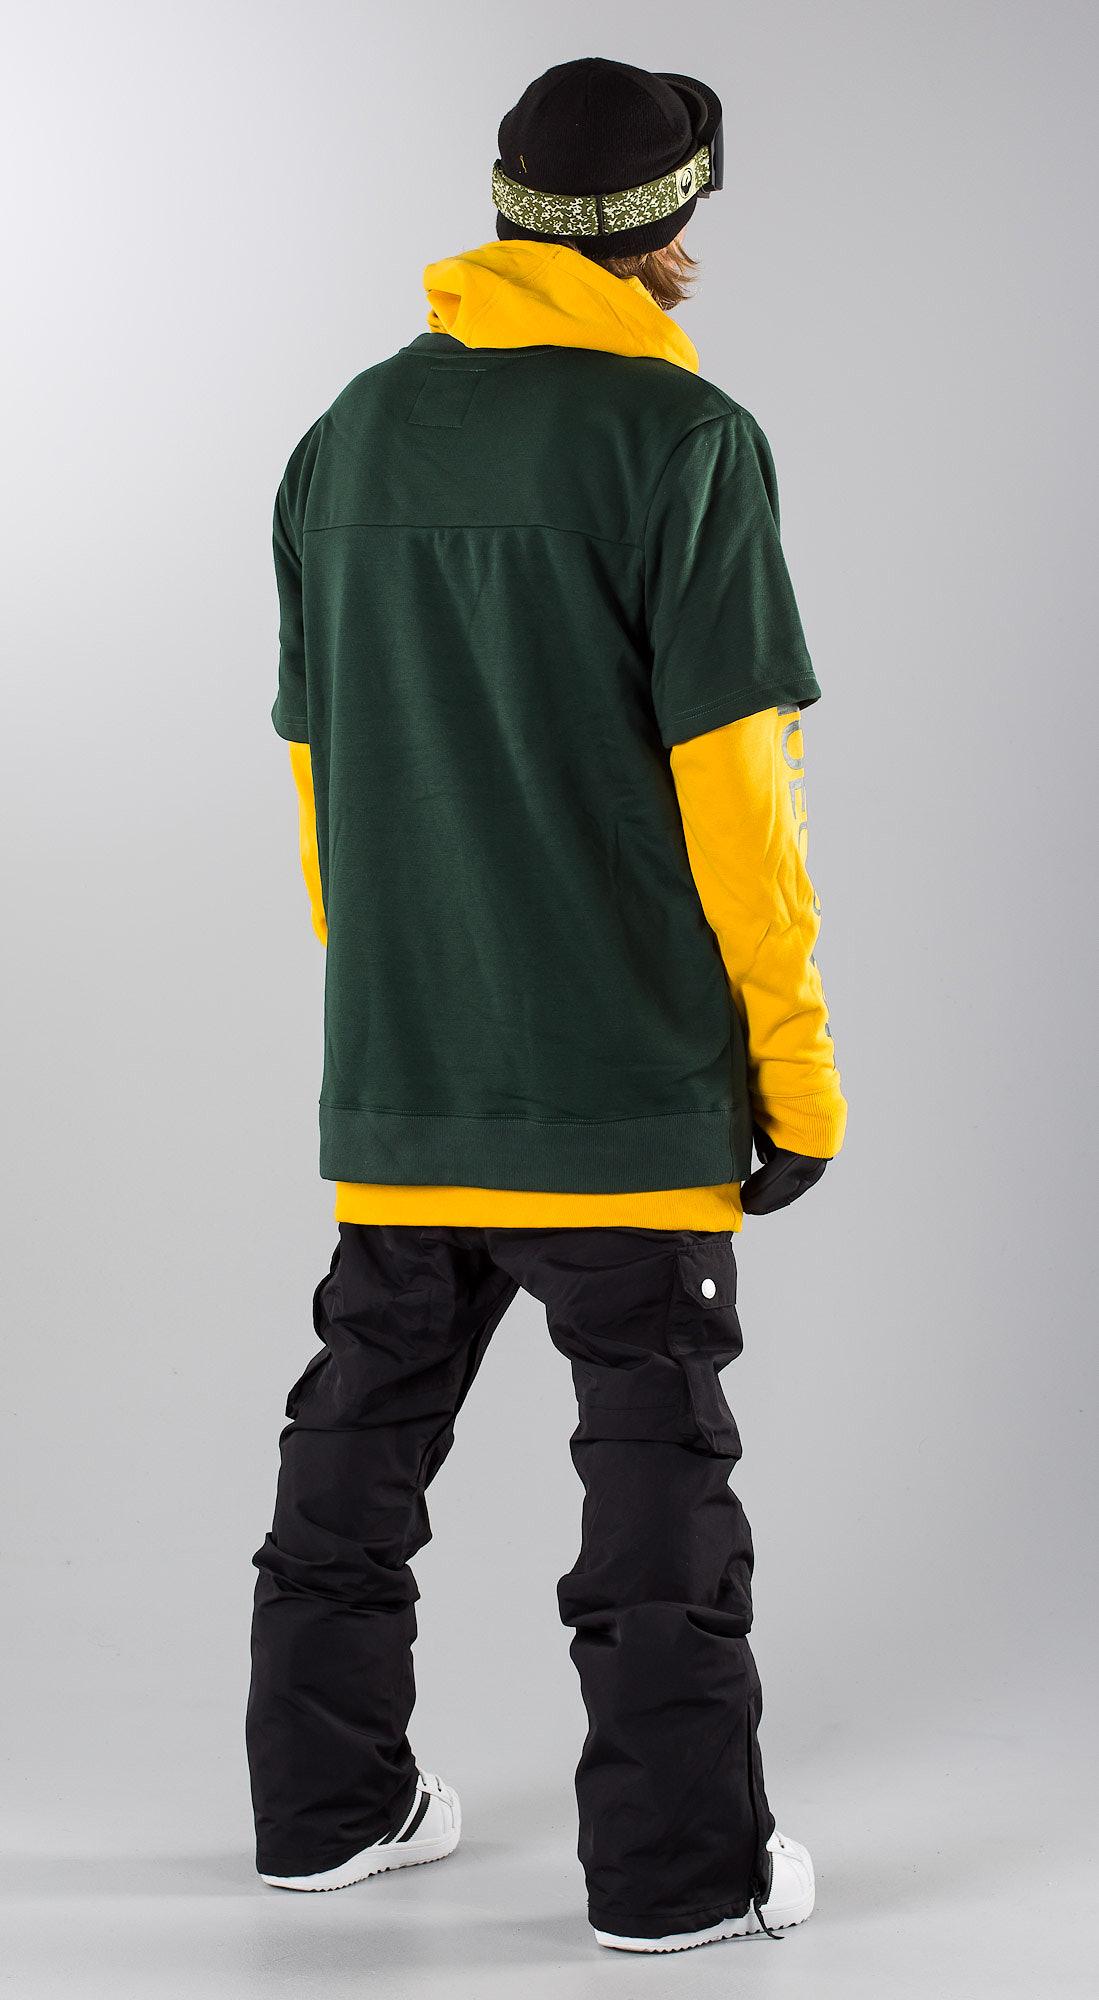 5ed27b908dc DC Dryden Pine Grove Snowboard clothing - Ridestore